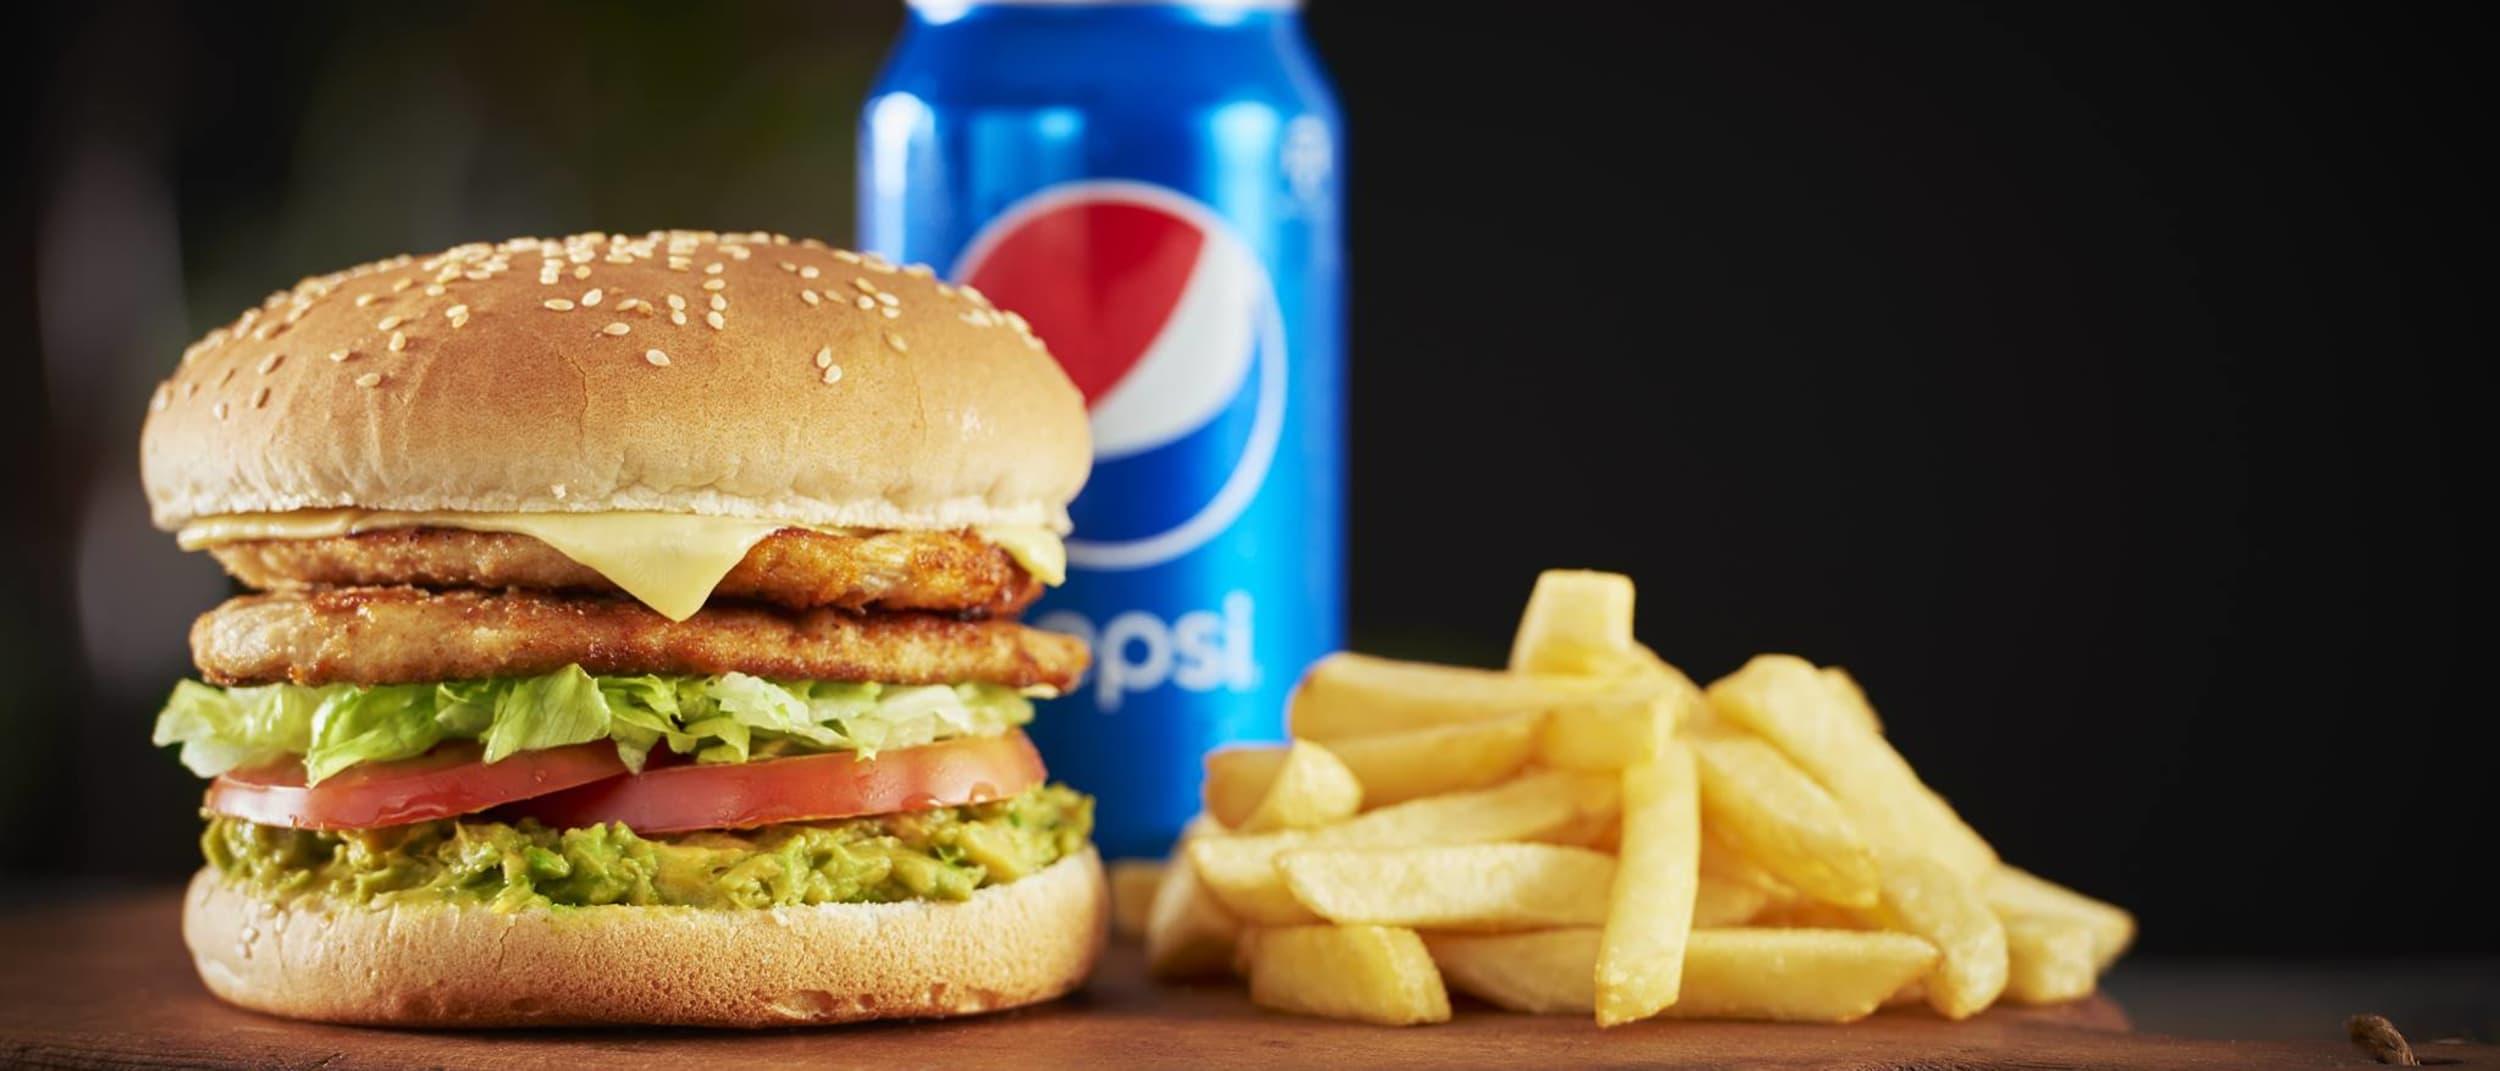 Ogalo Burger meals starting at just $13.40